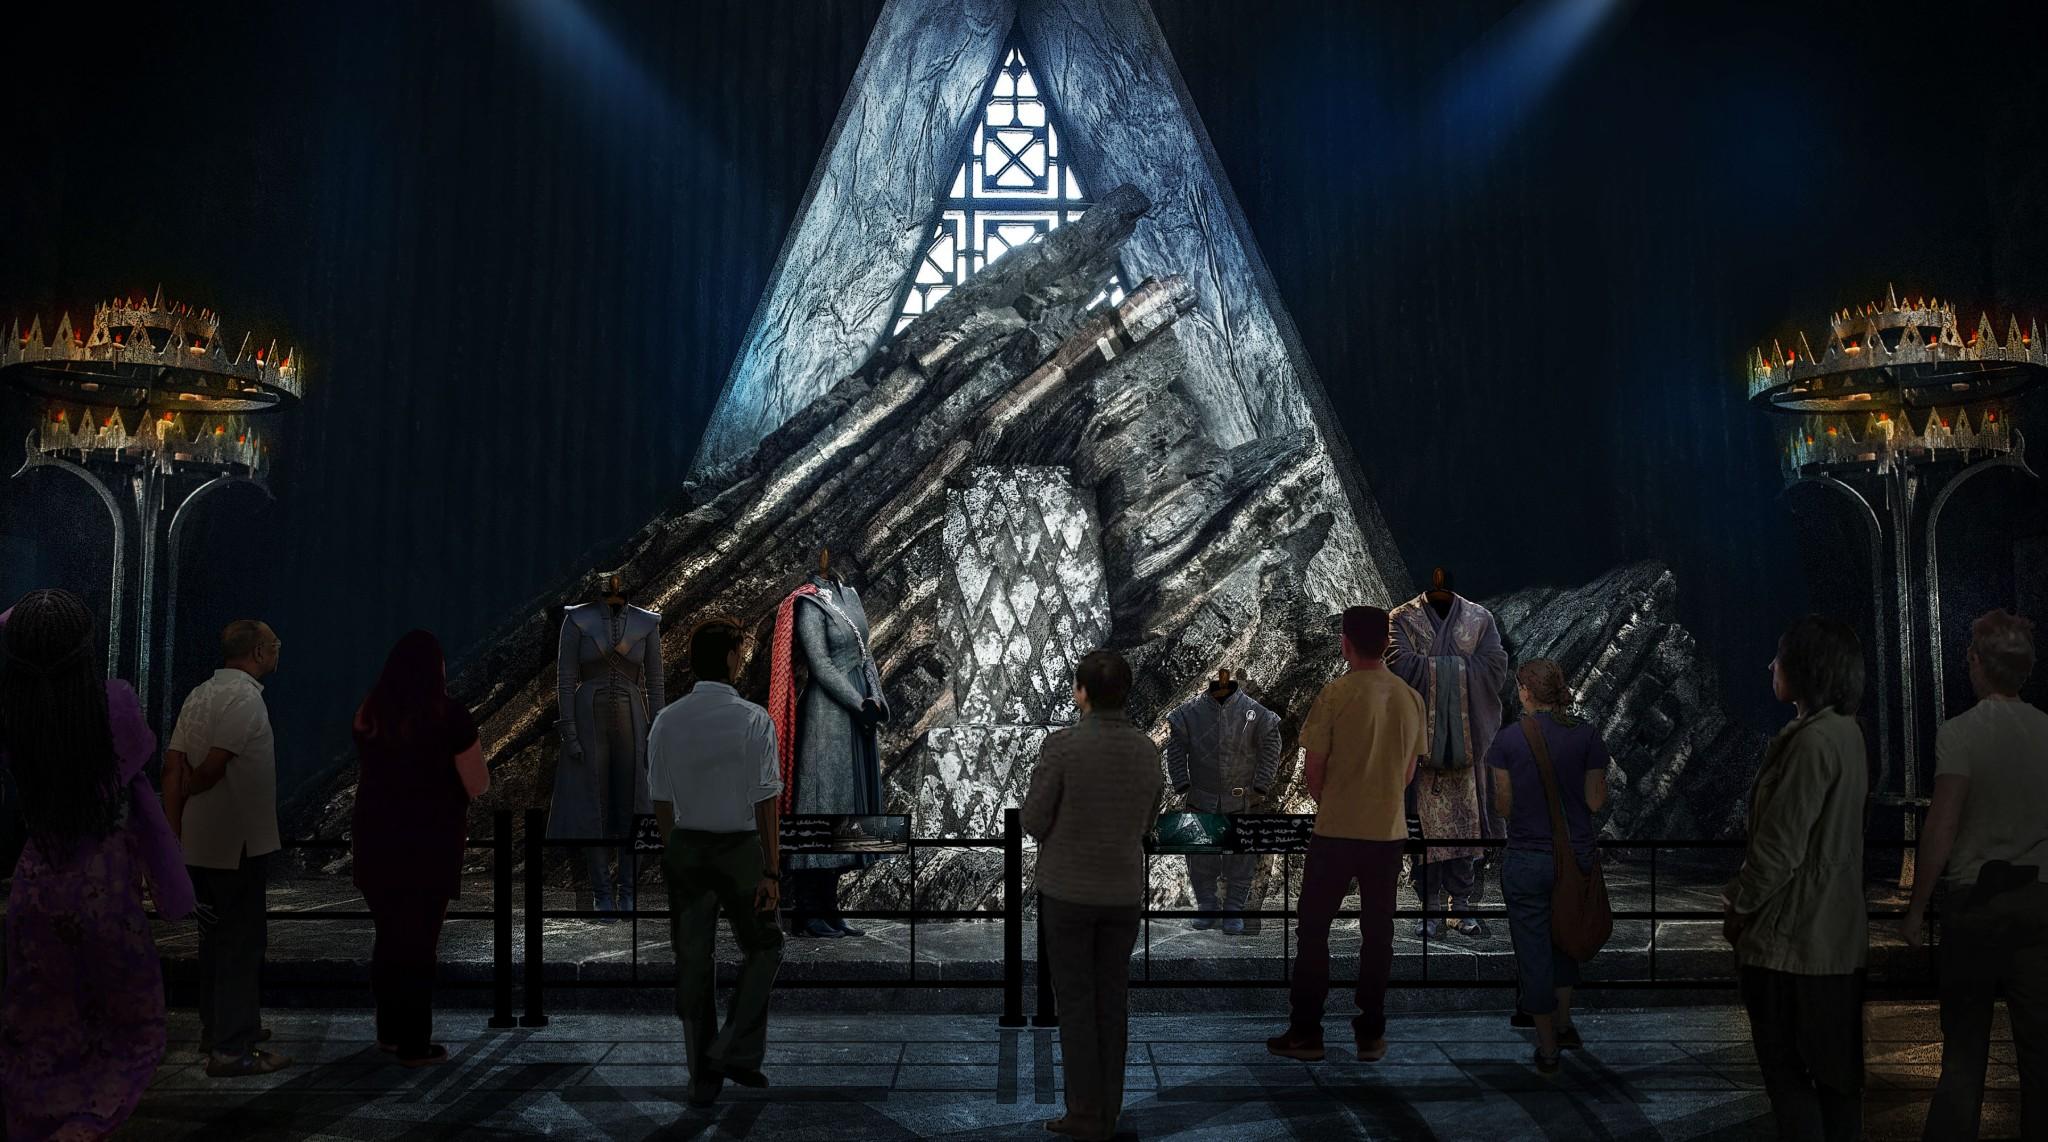 Parque temático Game of Thrones abre no próximo ano | Unibanco